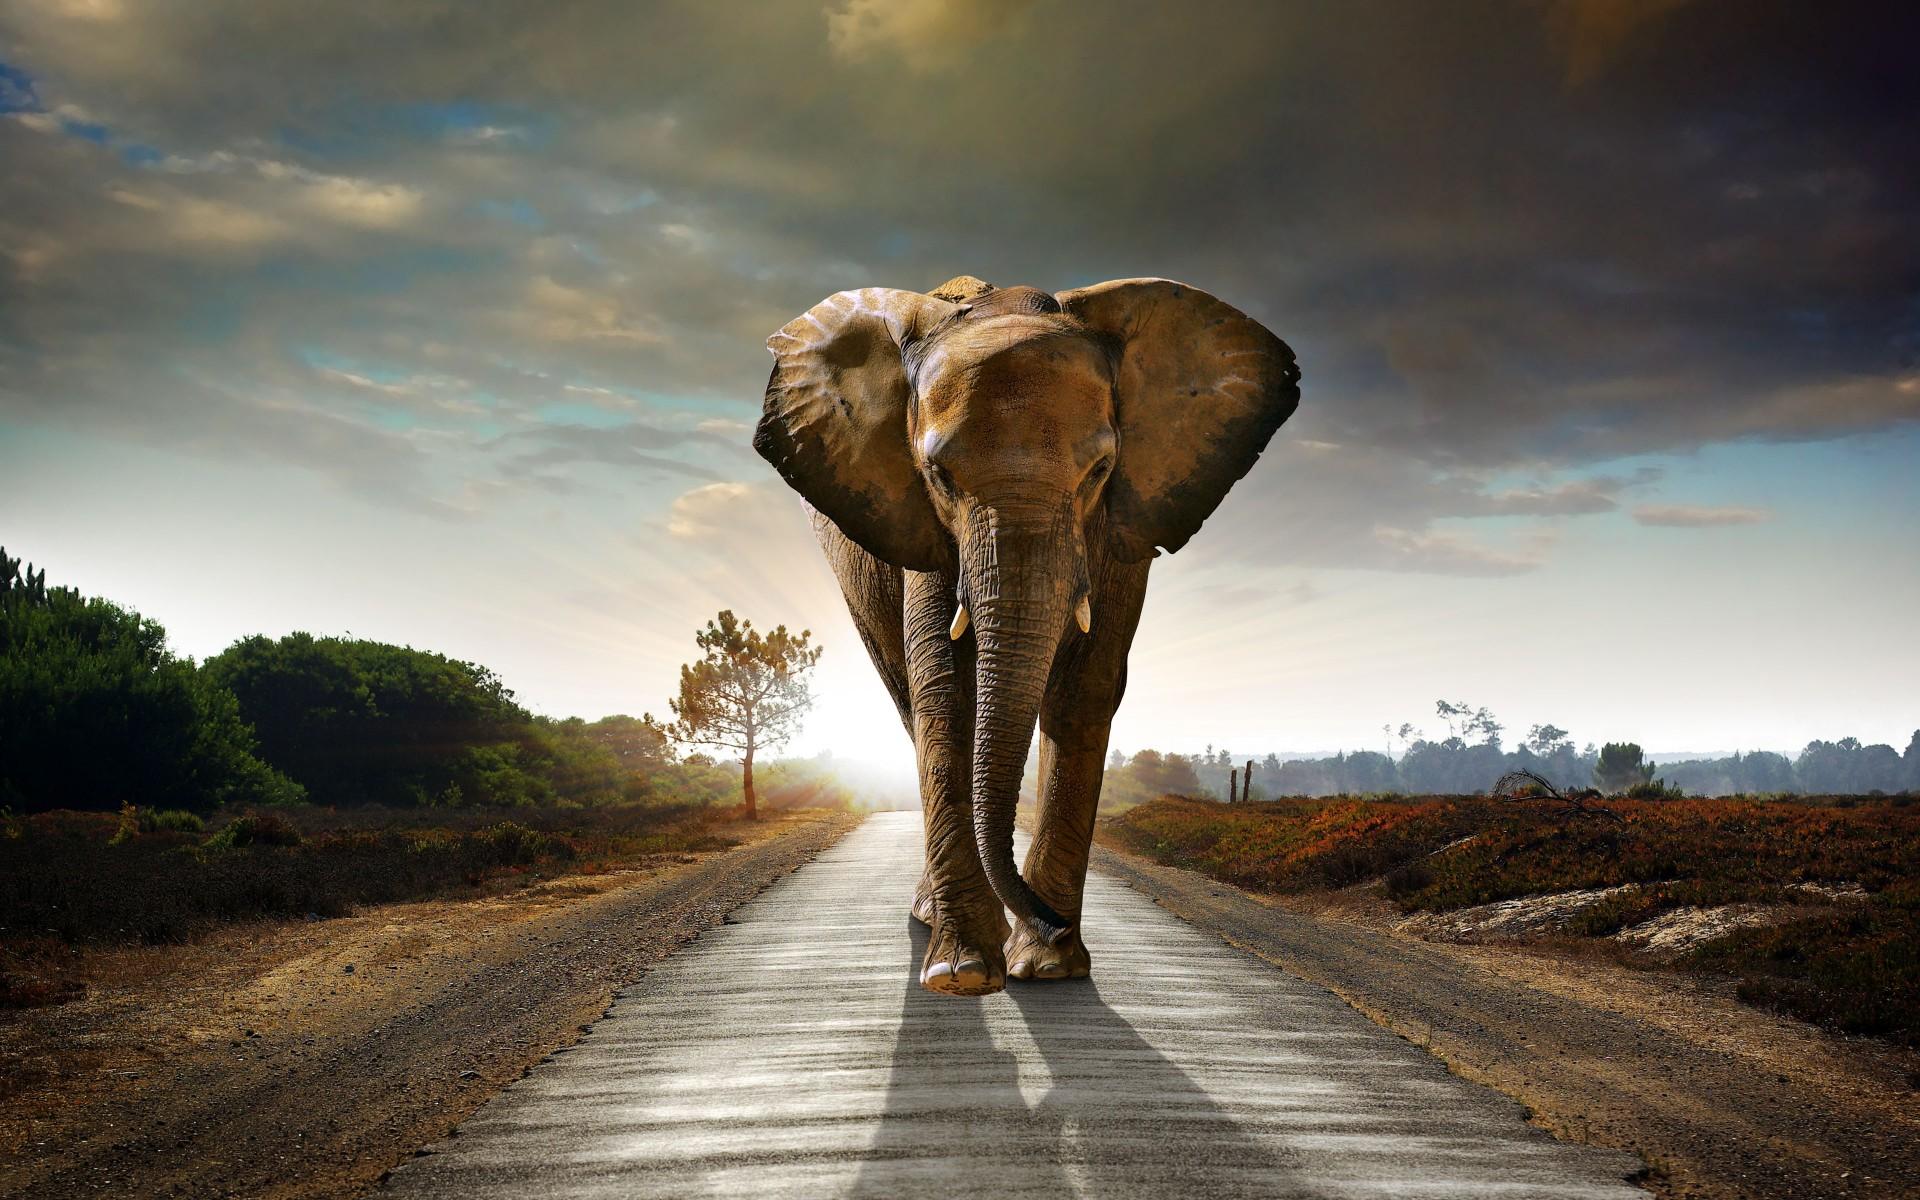 72 ] Elephant Desktop Backgrounds On WallpaperSafari